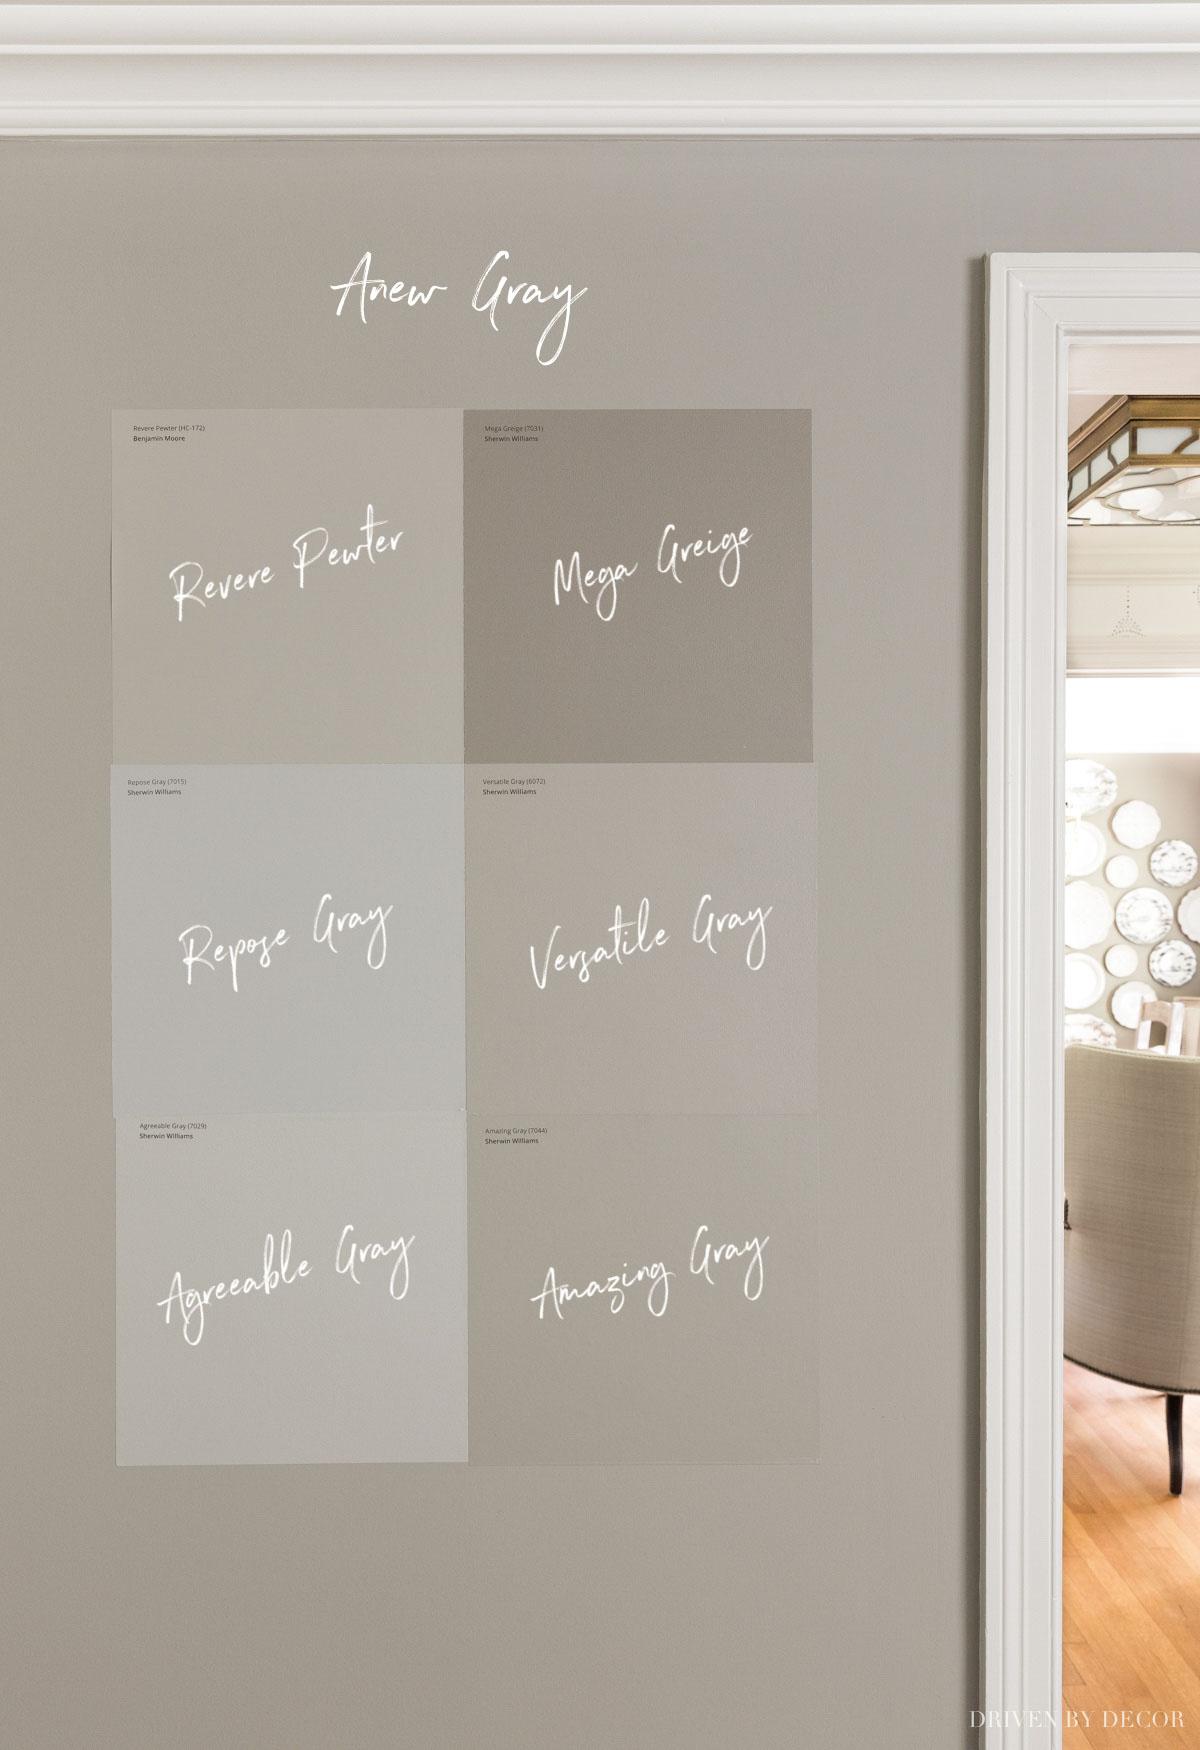 Anew Gray vs. six similar greige paint colors